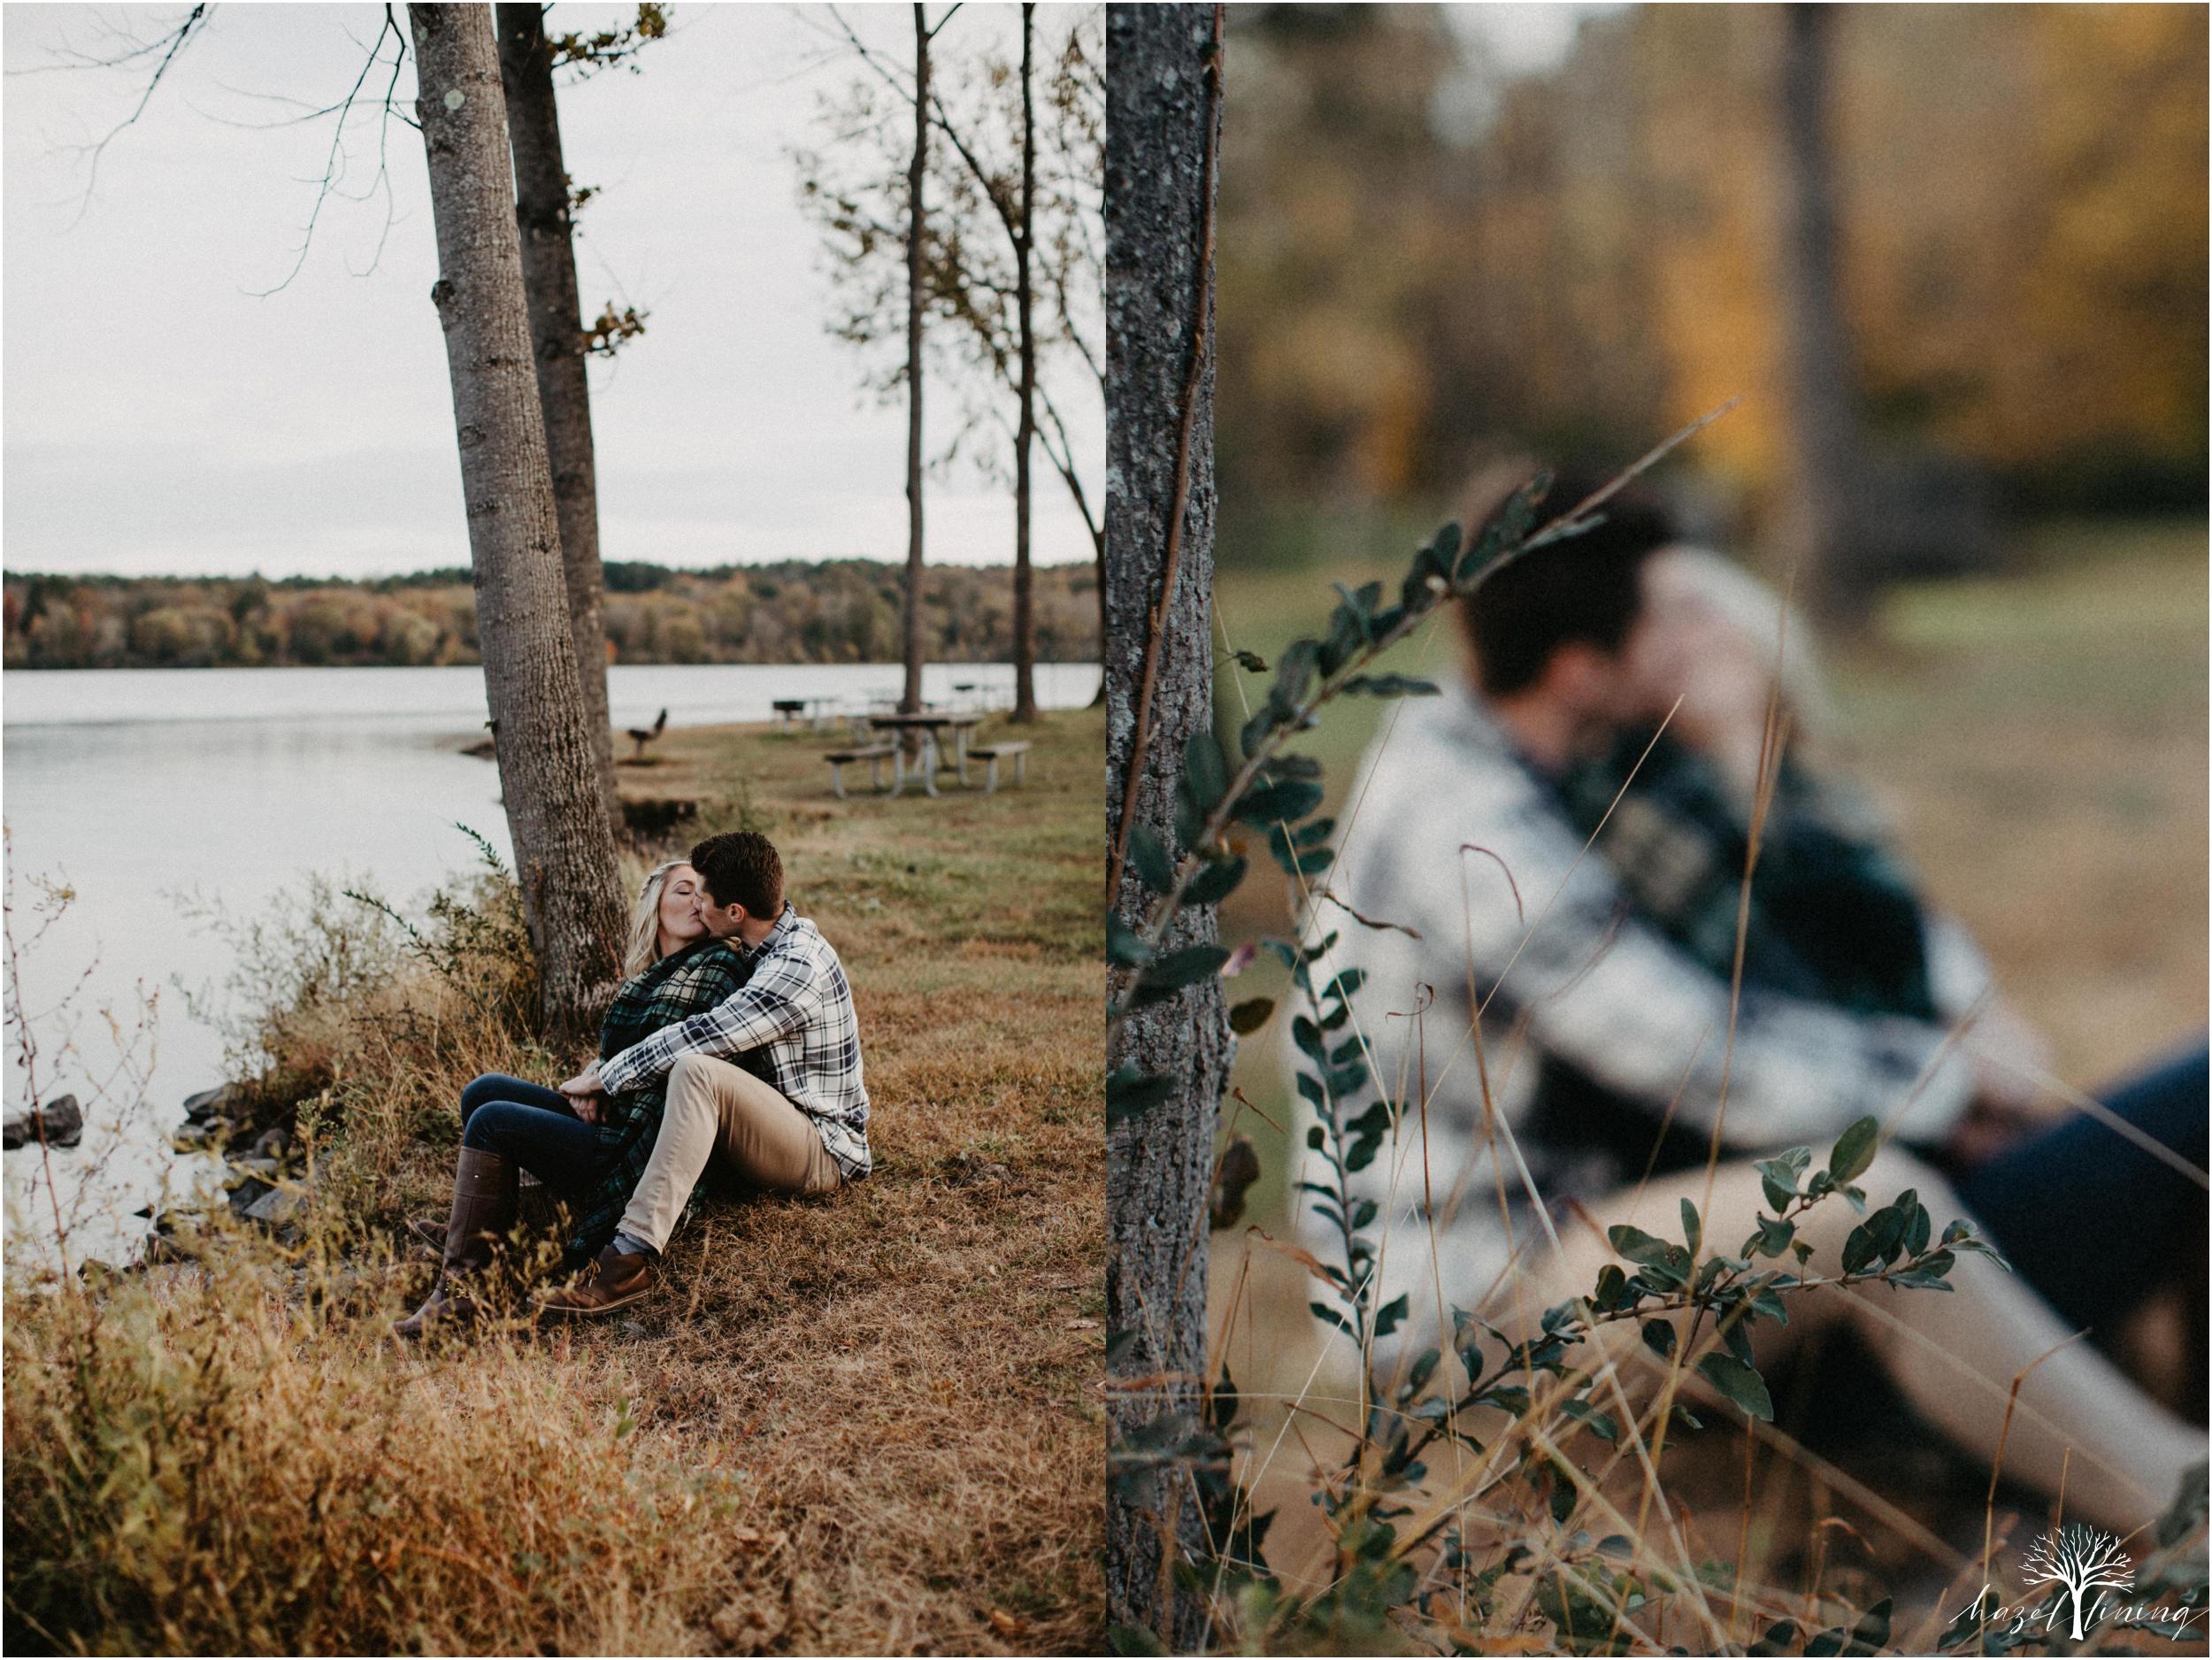 jessica-kern-david-siepietowski-lake-nockamixon-autumn-engagement-session_0037.jpg